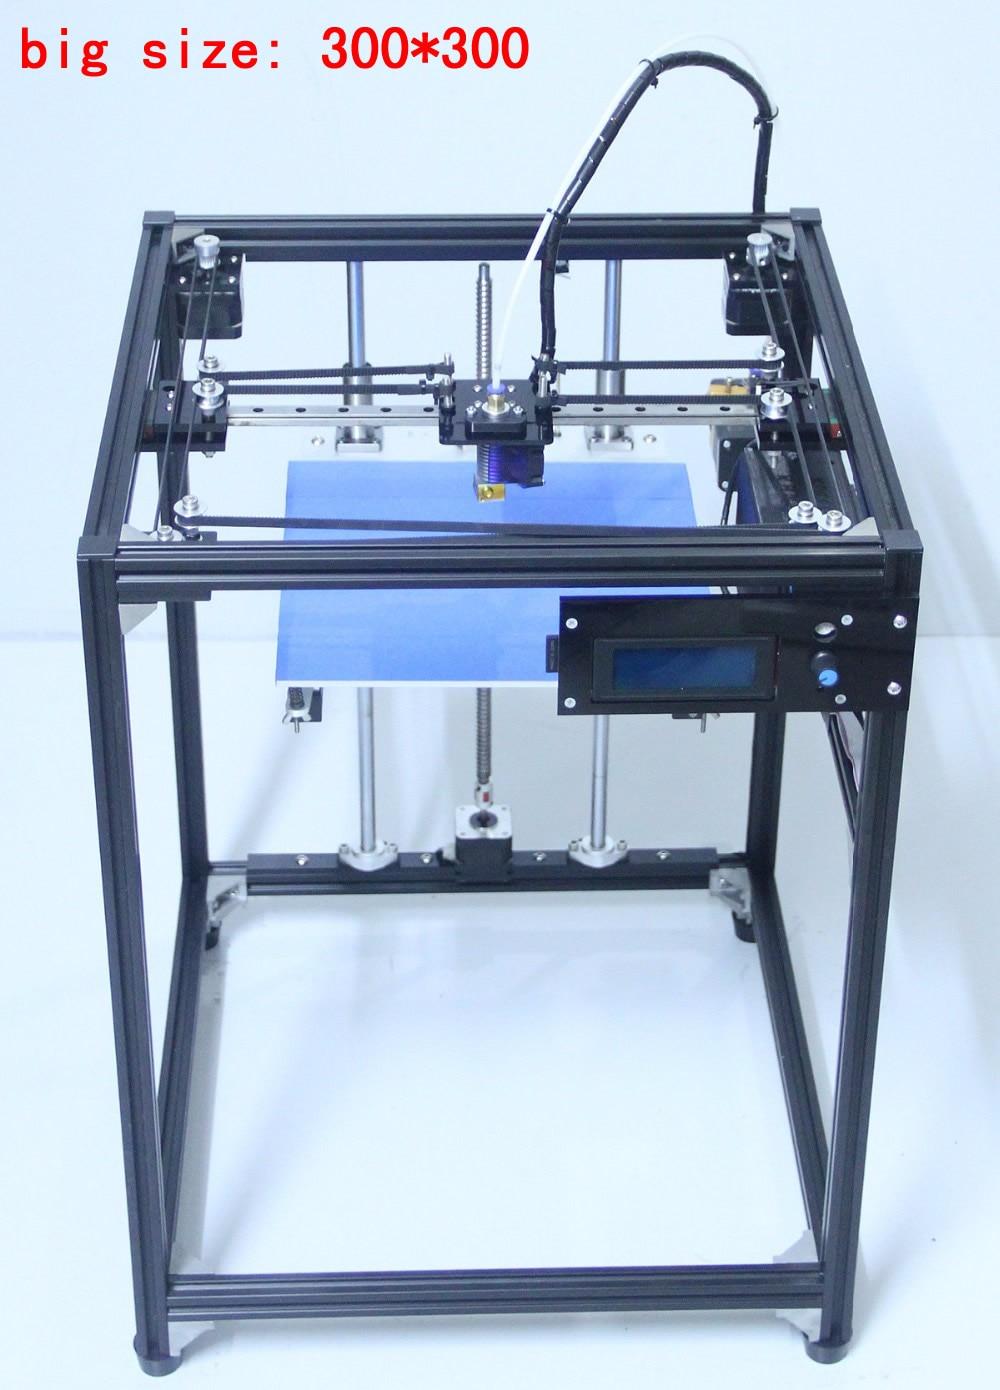 printer 3D 2017 big size 300*300 3D Printer Machine Ramps 1.4 plus black corexy Full Kit 3d printer kit flsun 3d printer big pulley kossel 3d printer with one roll filament sd card fast shipping